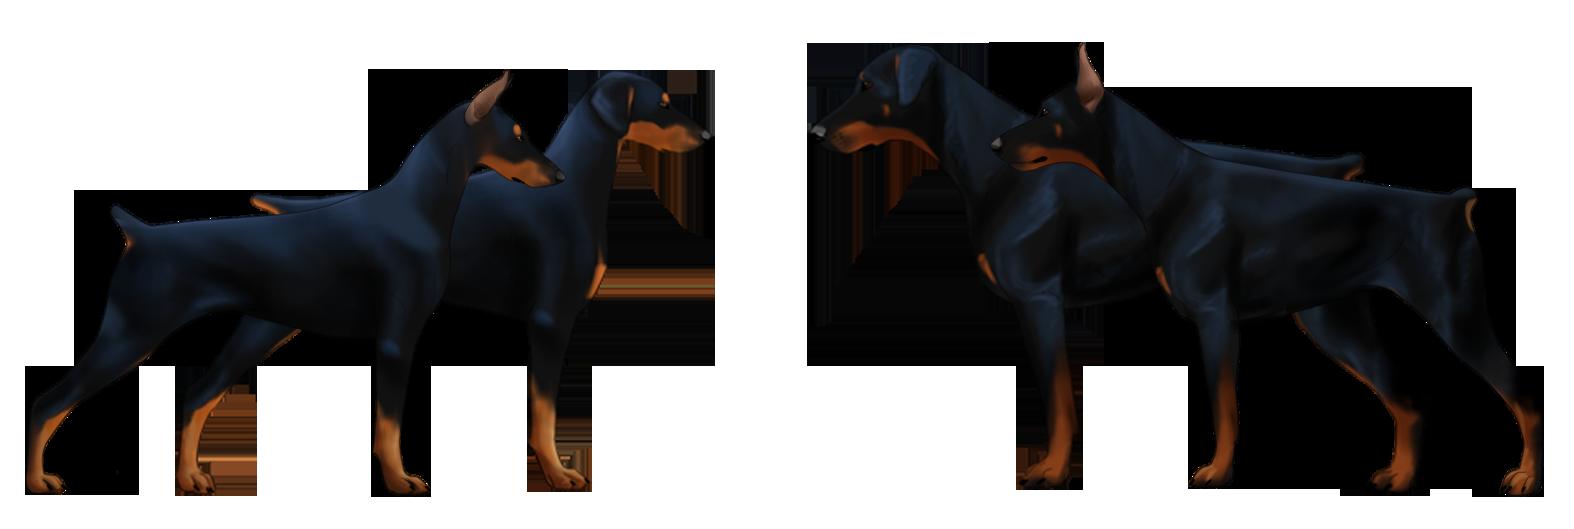 Doberman Dog Fight Video